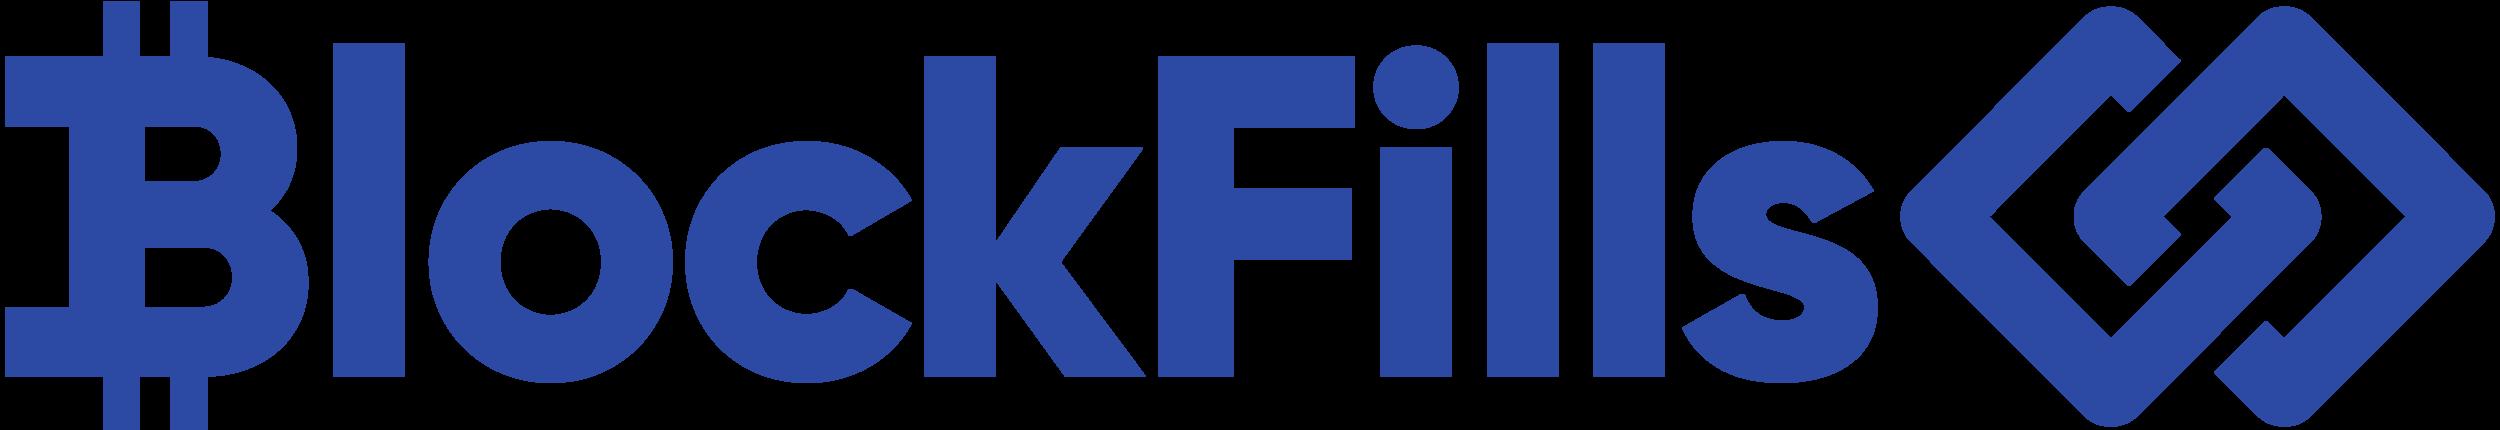 blockfills_logo.png